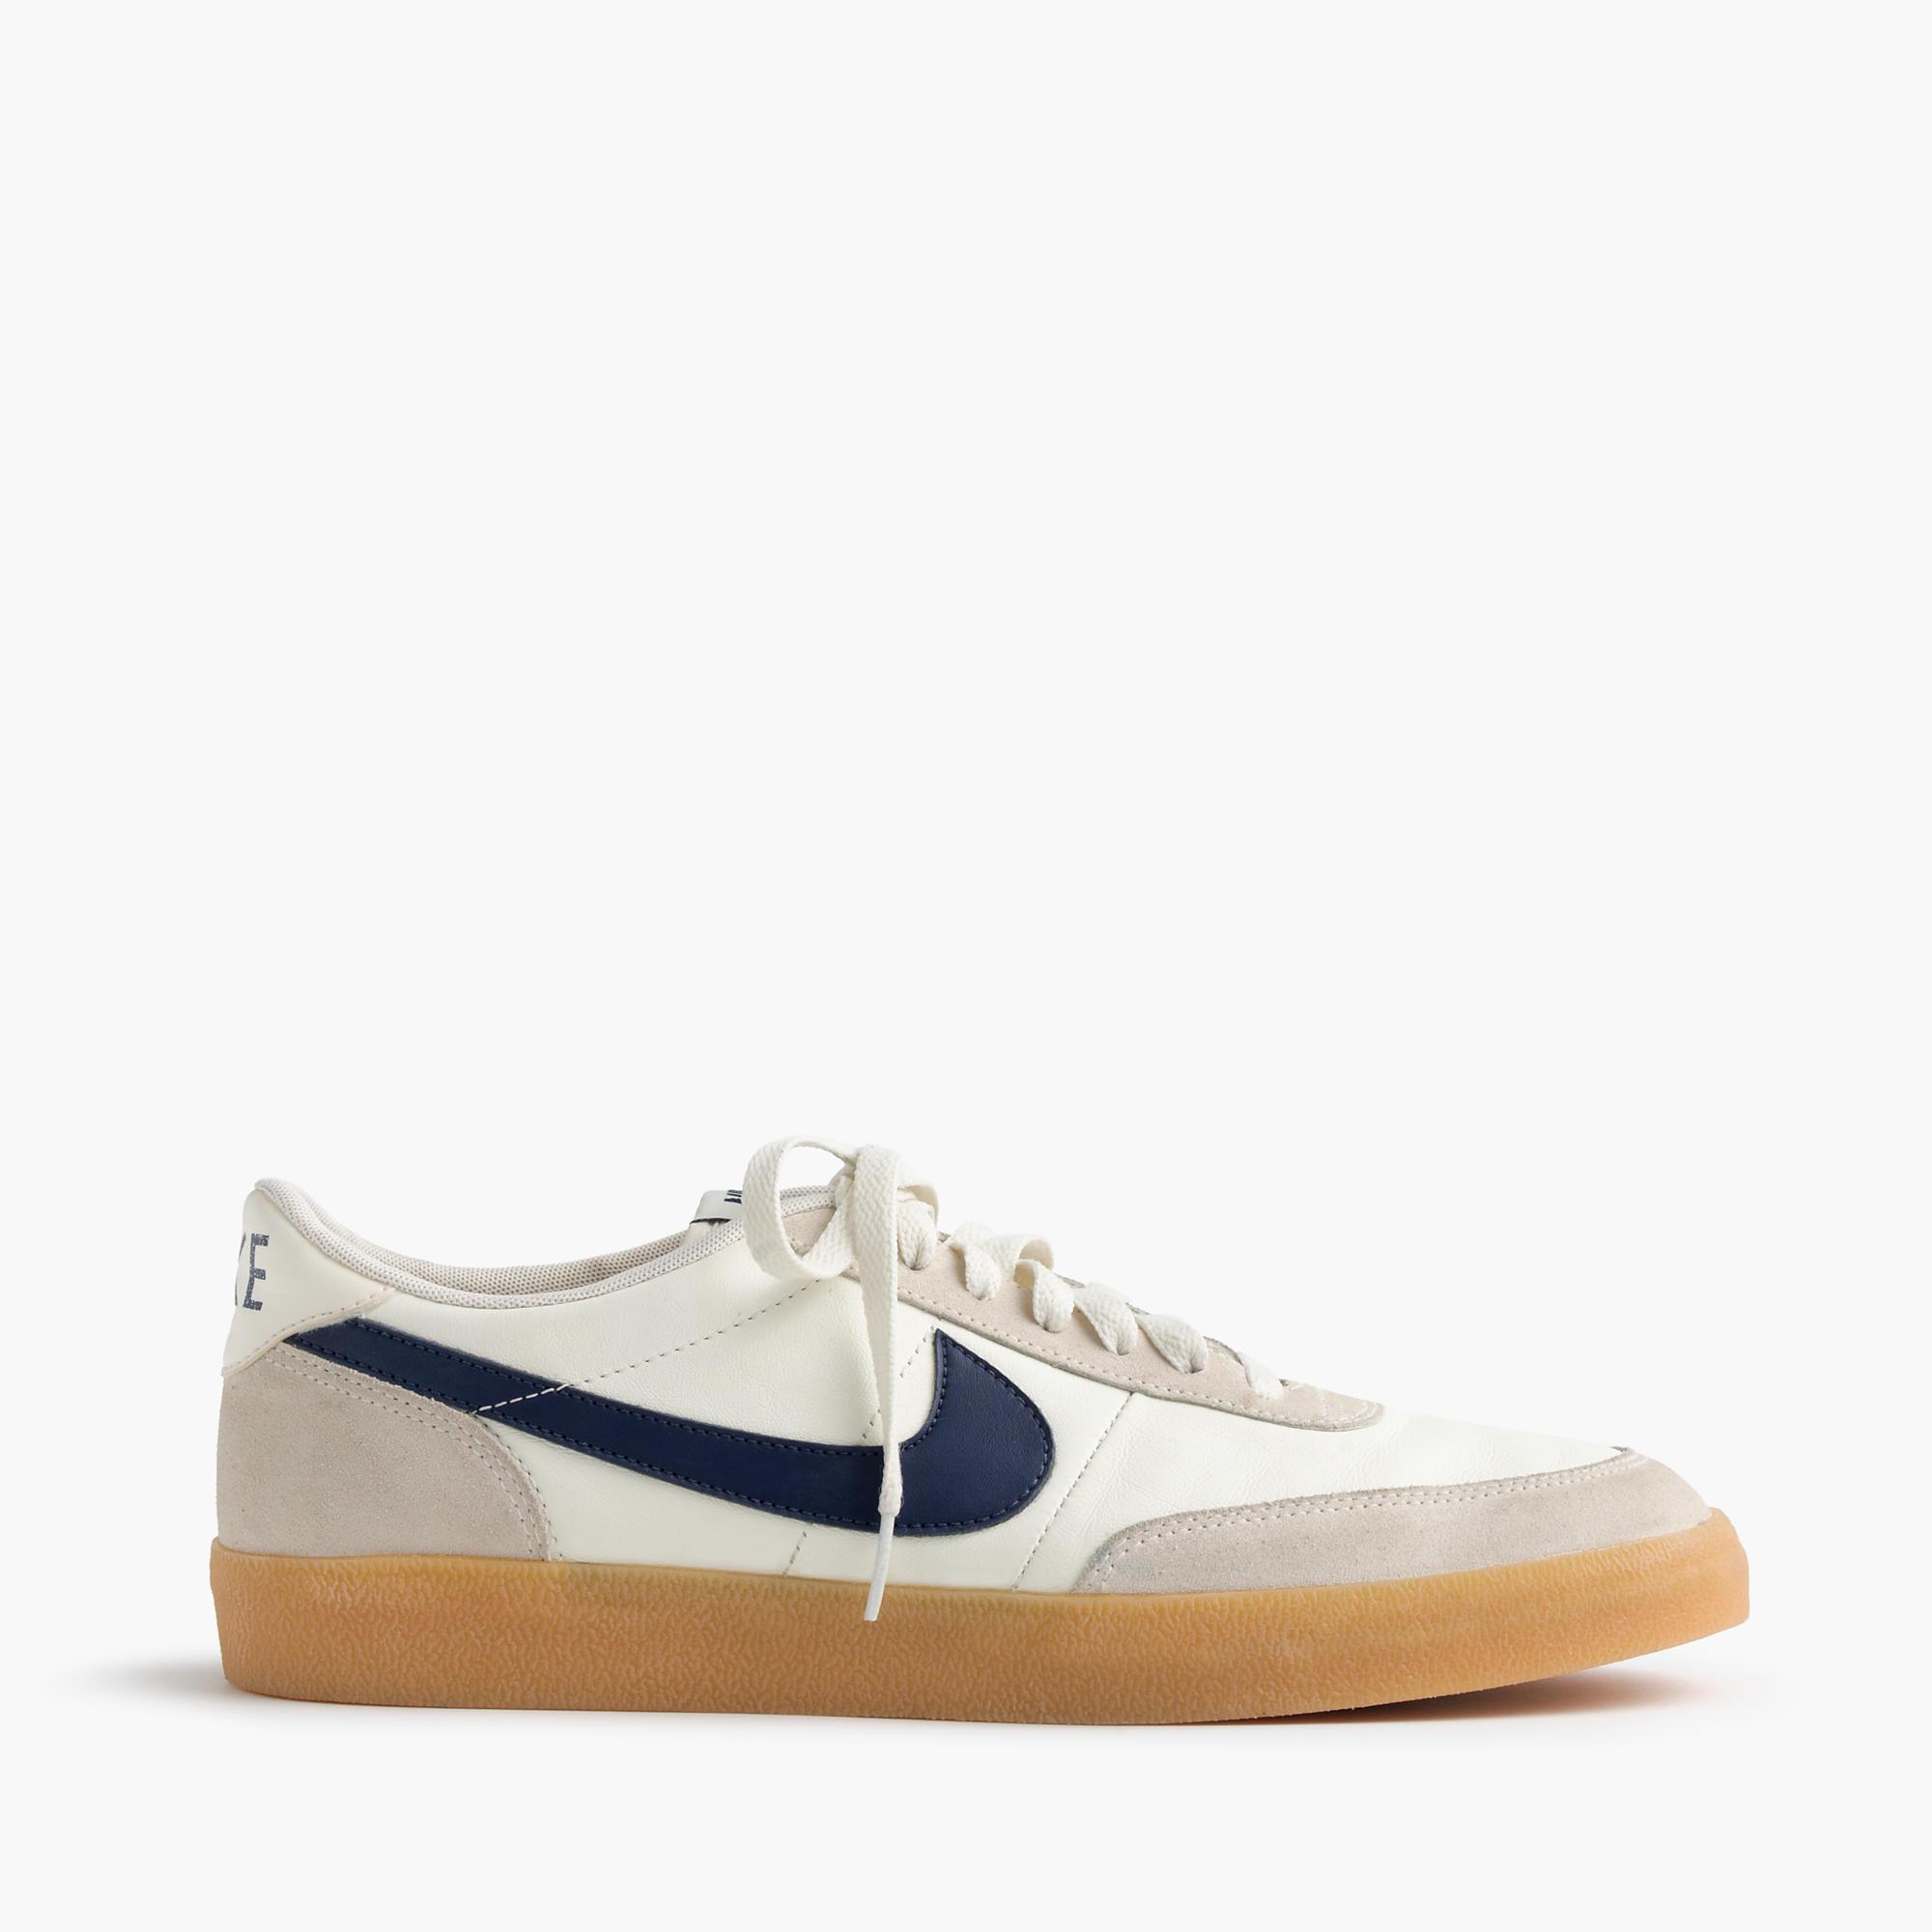 J Crew Shoes Mens Nike